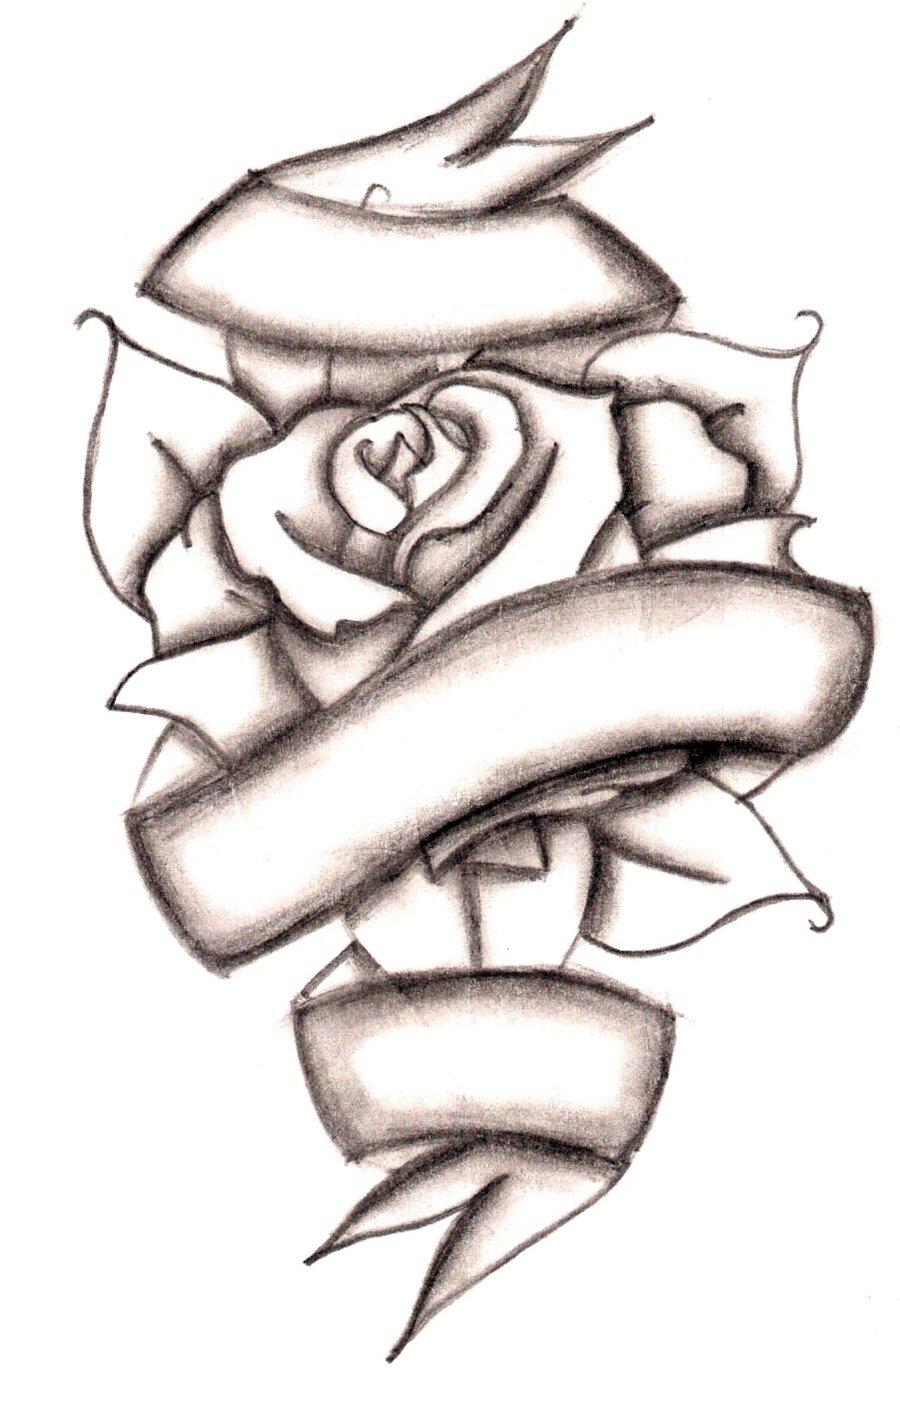 900x1418 Drawings Of Hearts With Ribbons Drawn Ribbon Heart Banner